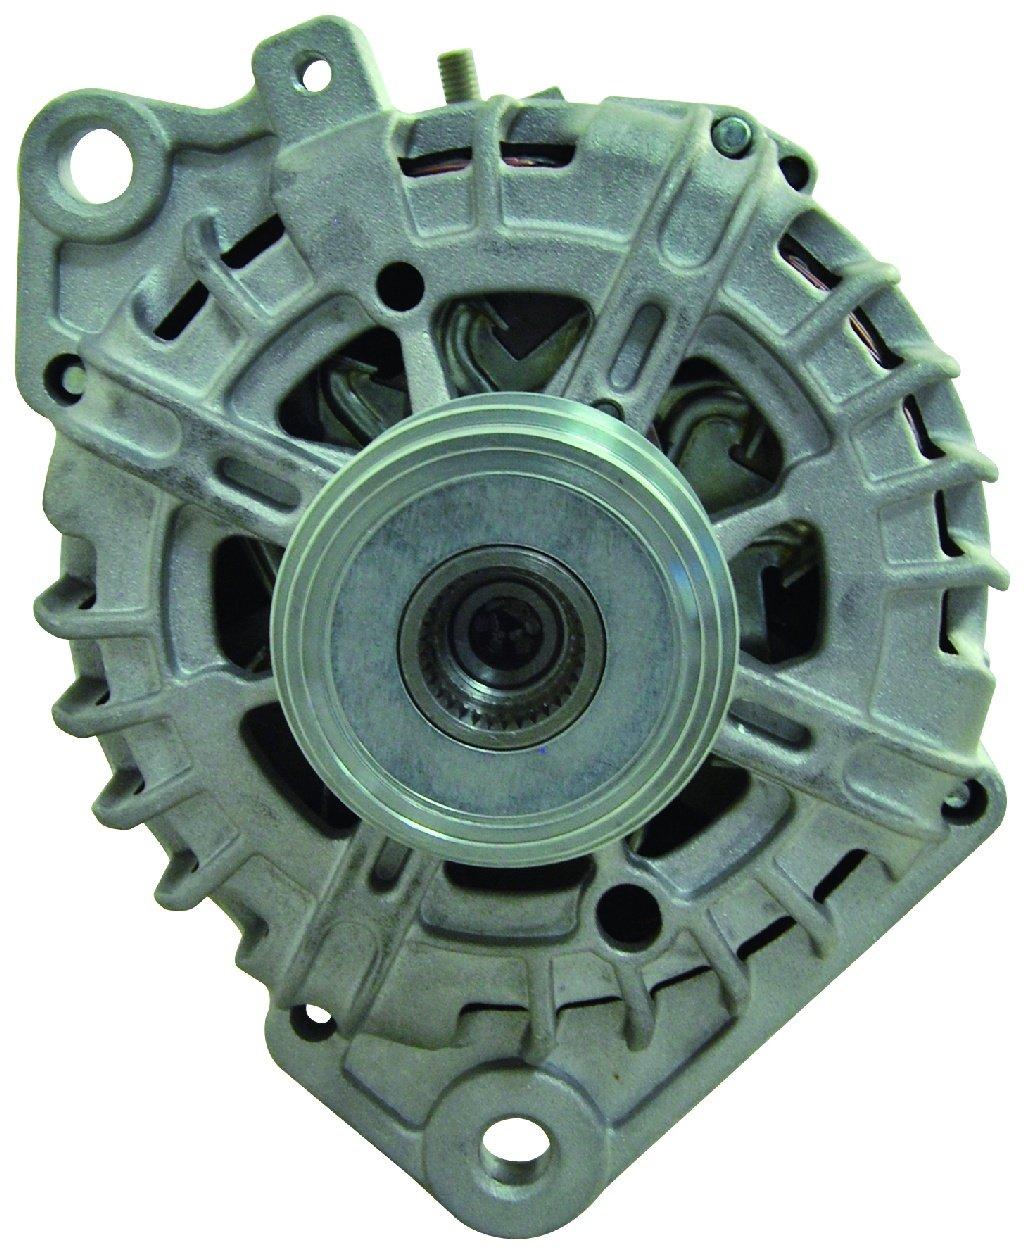 Premier Gear PG-11258 Professional Grade New Alternator